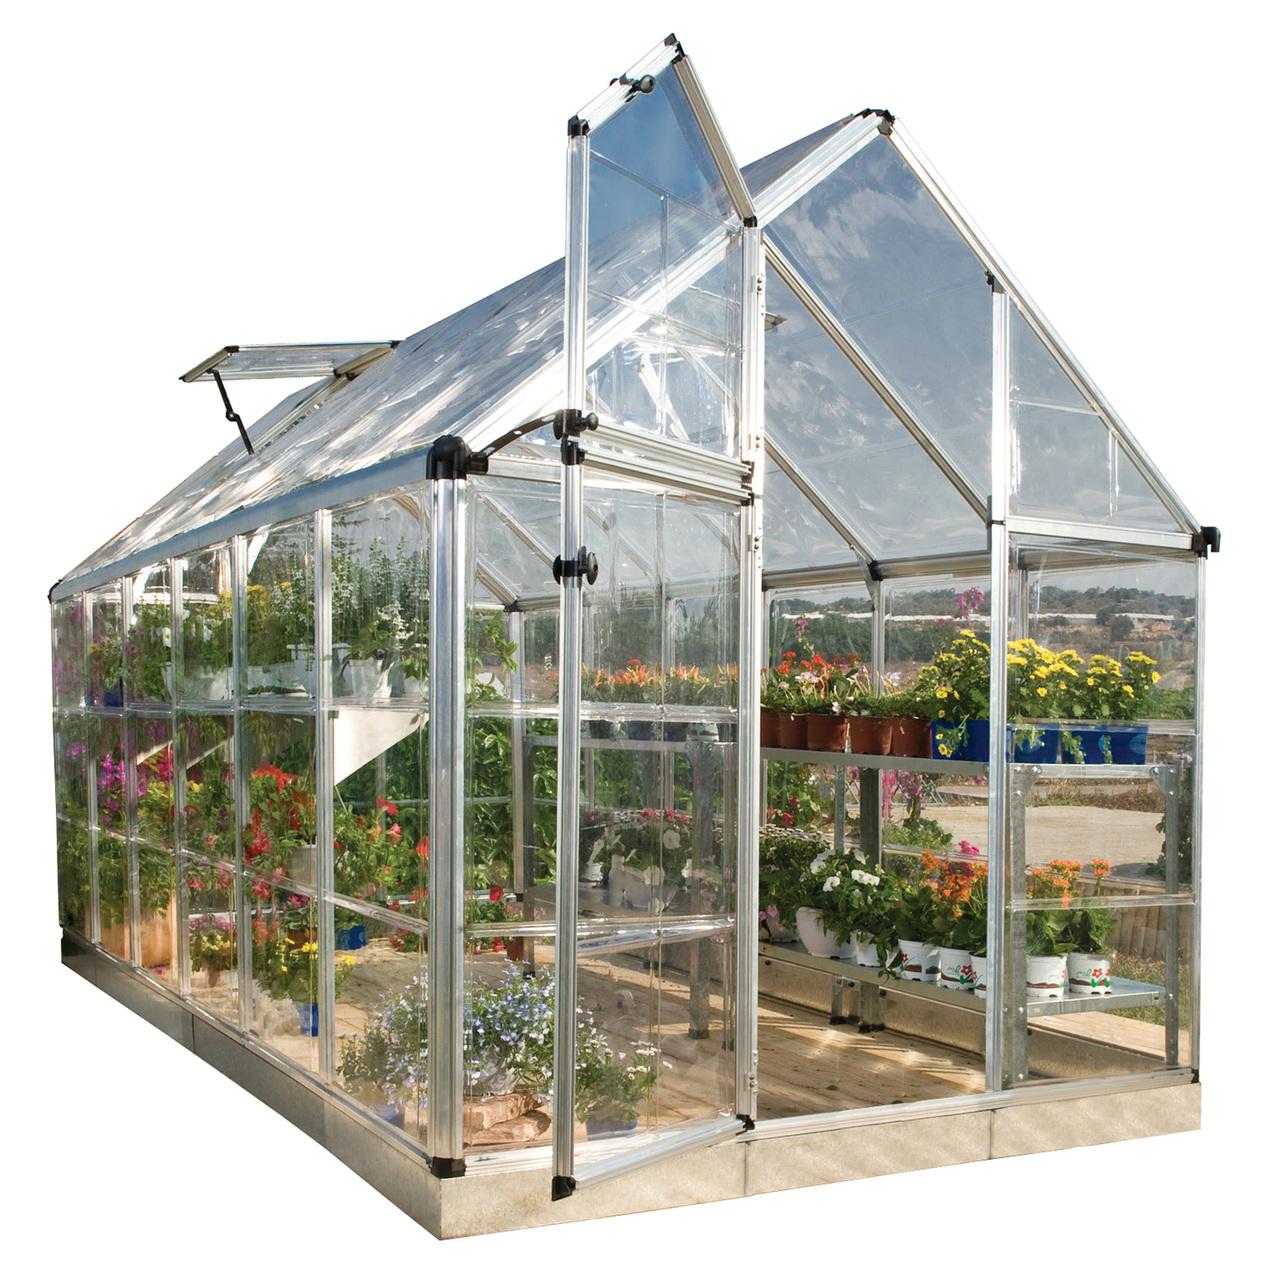 Palram Snap & Grow 6' x 12' Hobby Greenhouse - Silver